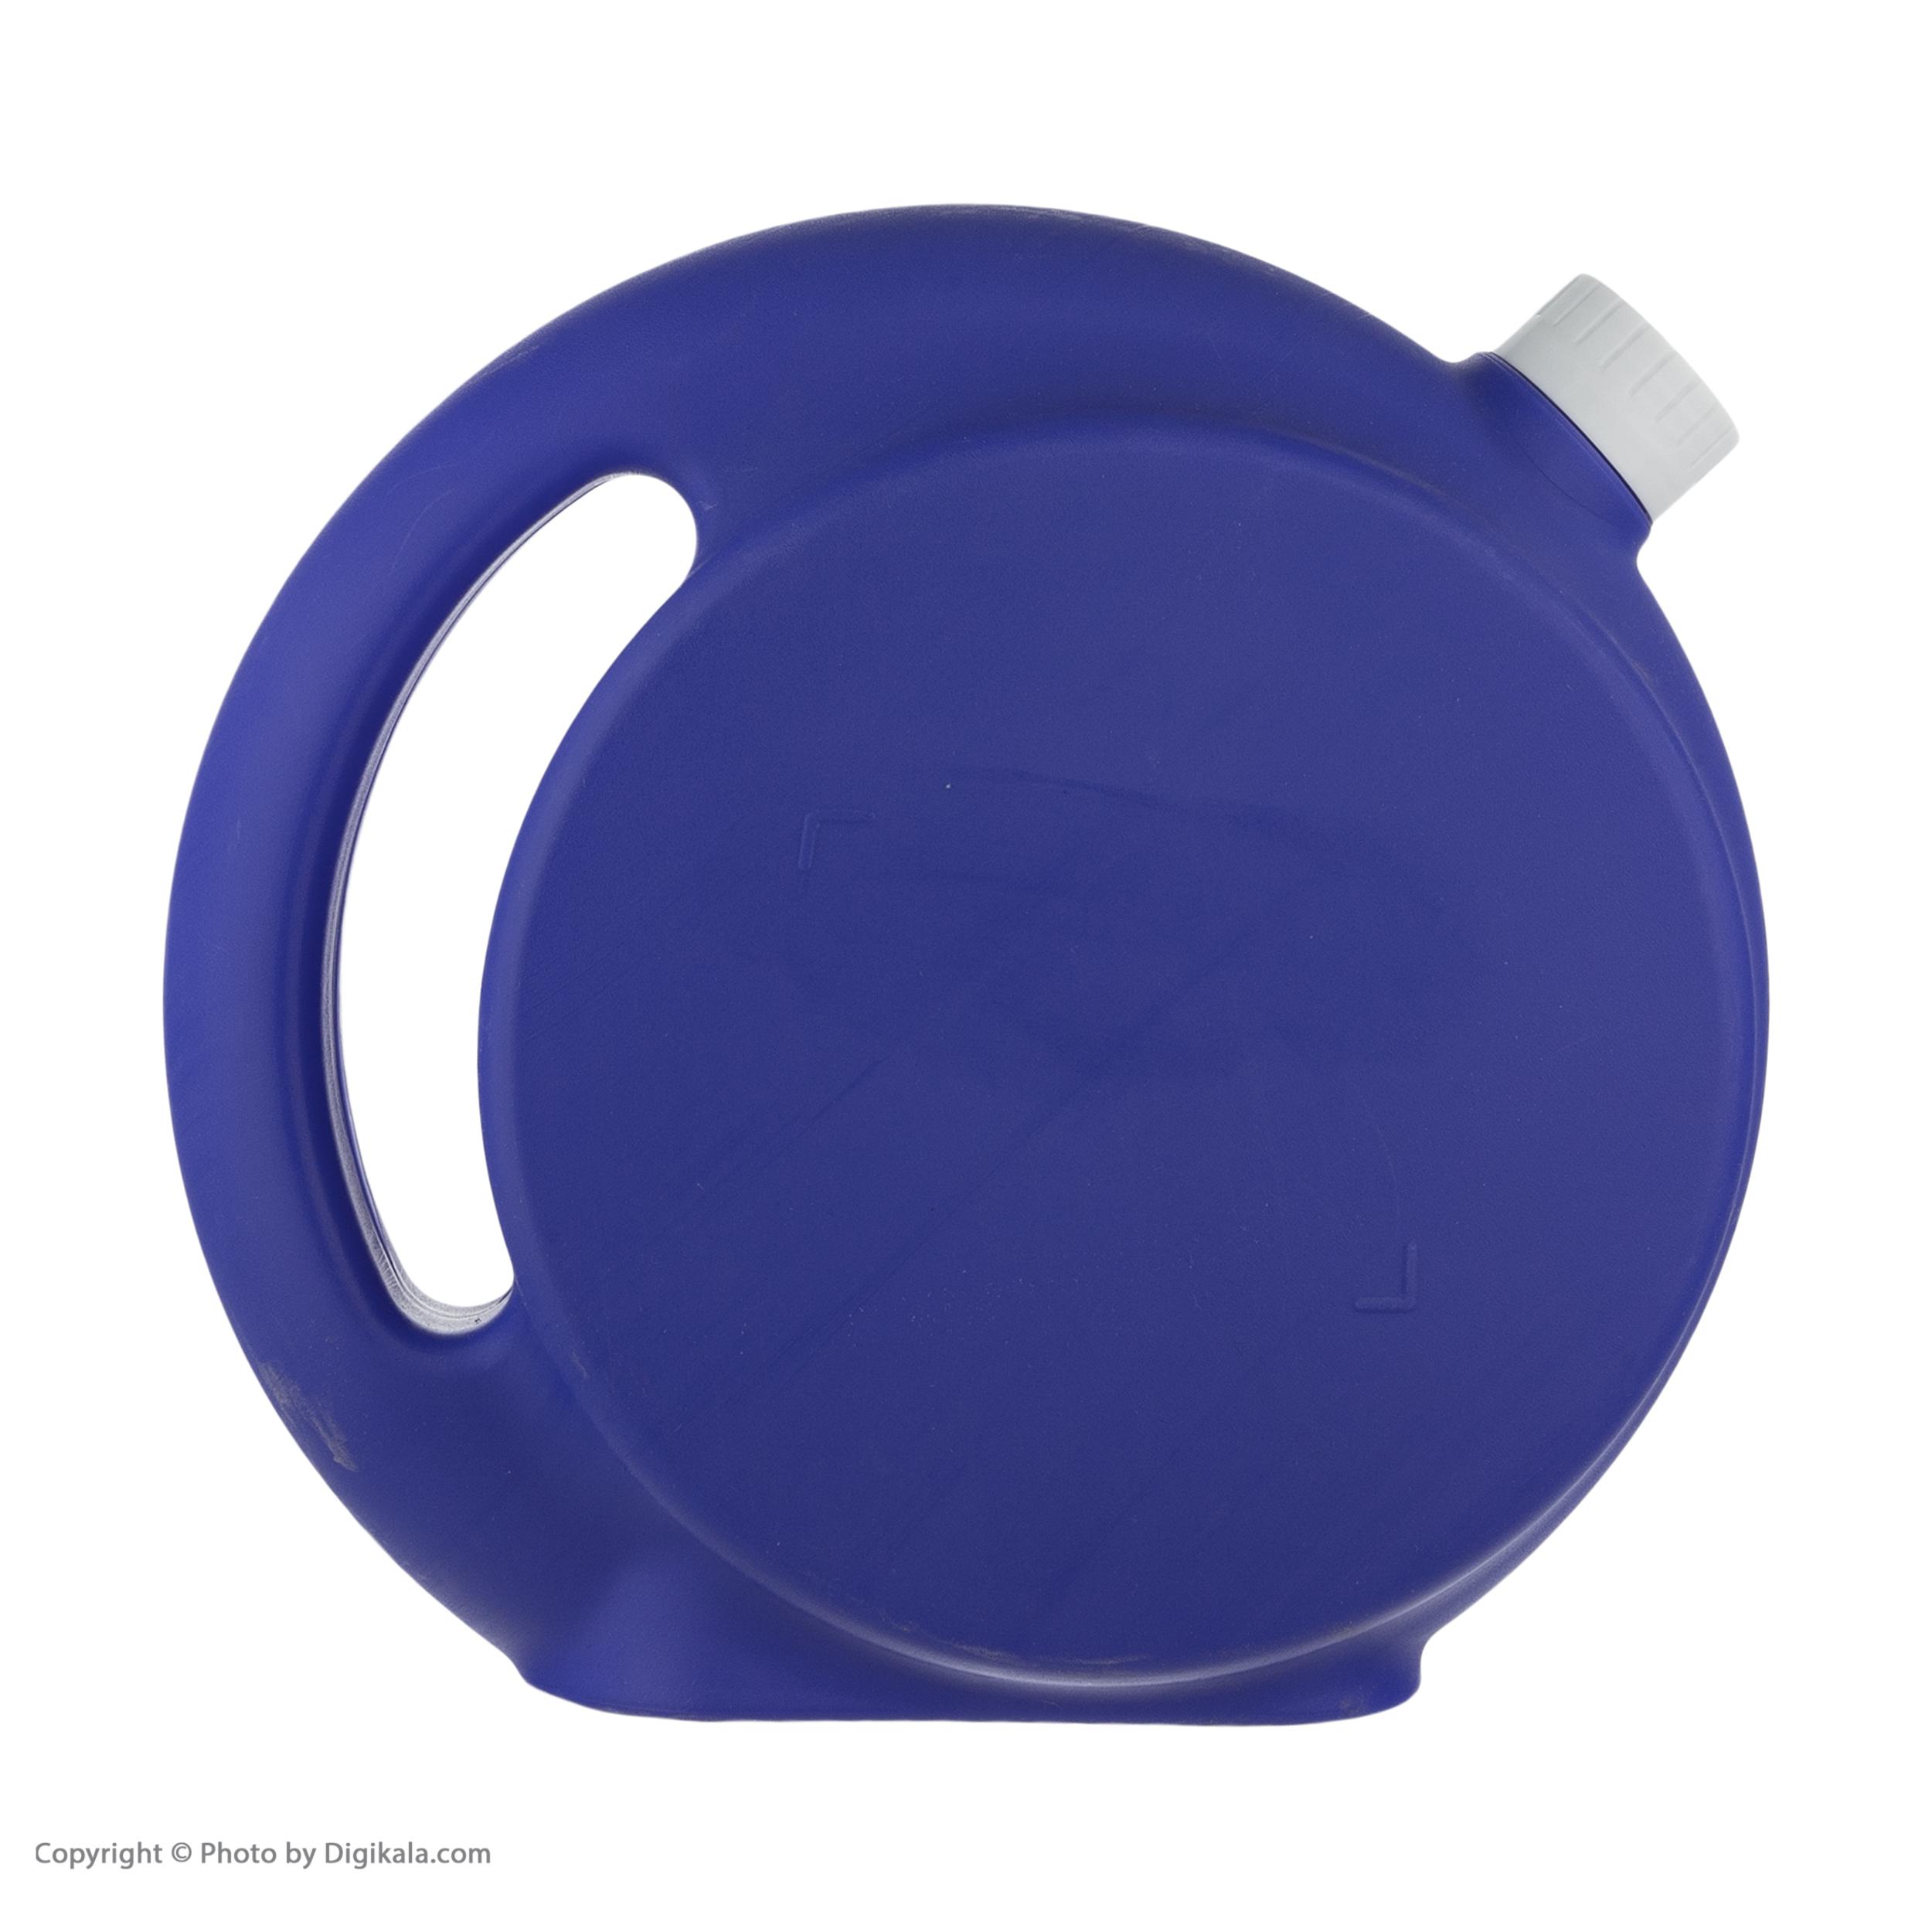 مایع دستشویی ایوان مدل Blueberry And Flower وزن 3.5 کیلوگرم main 1 1